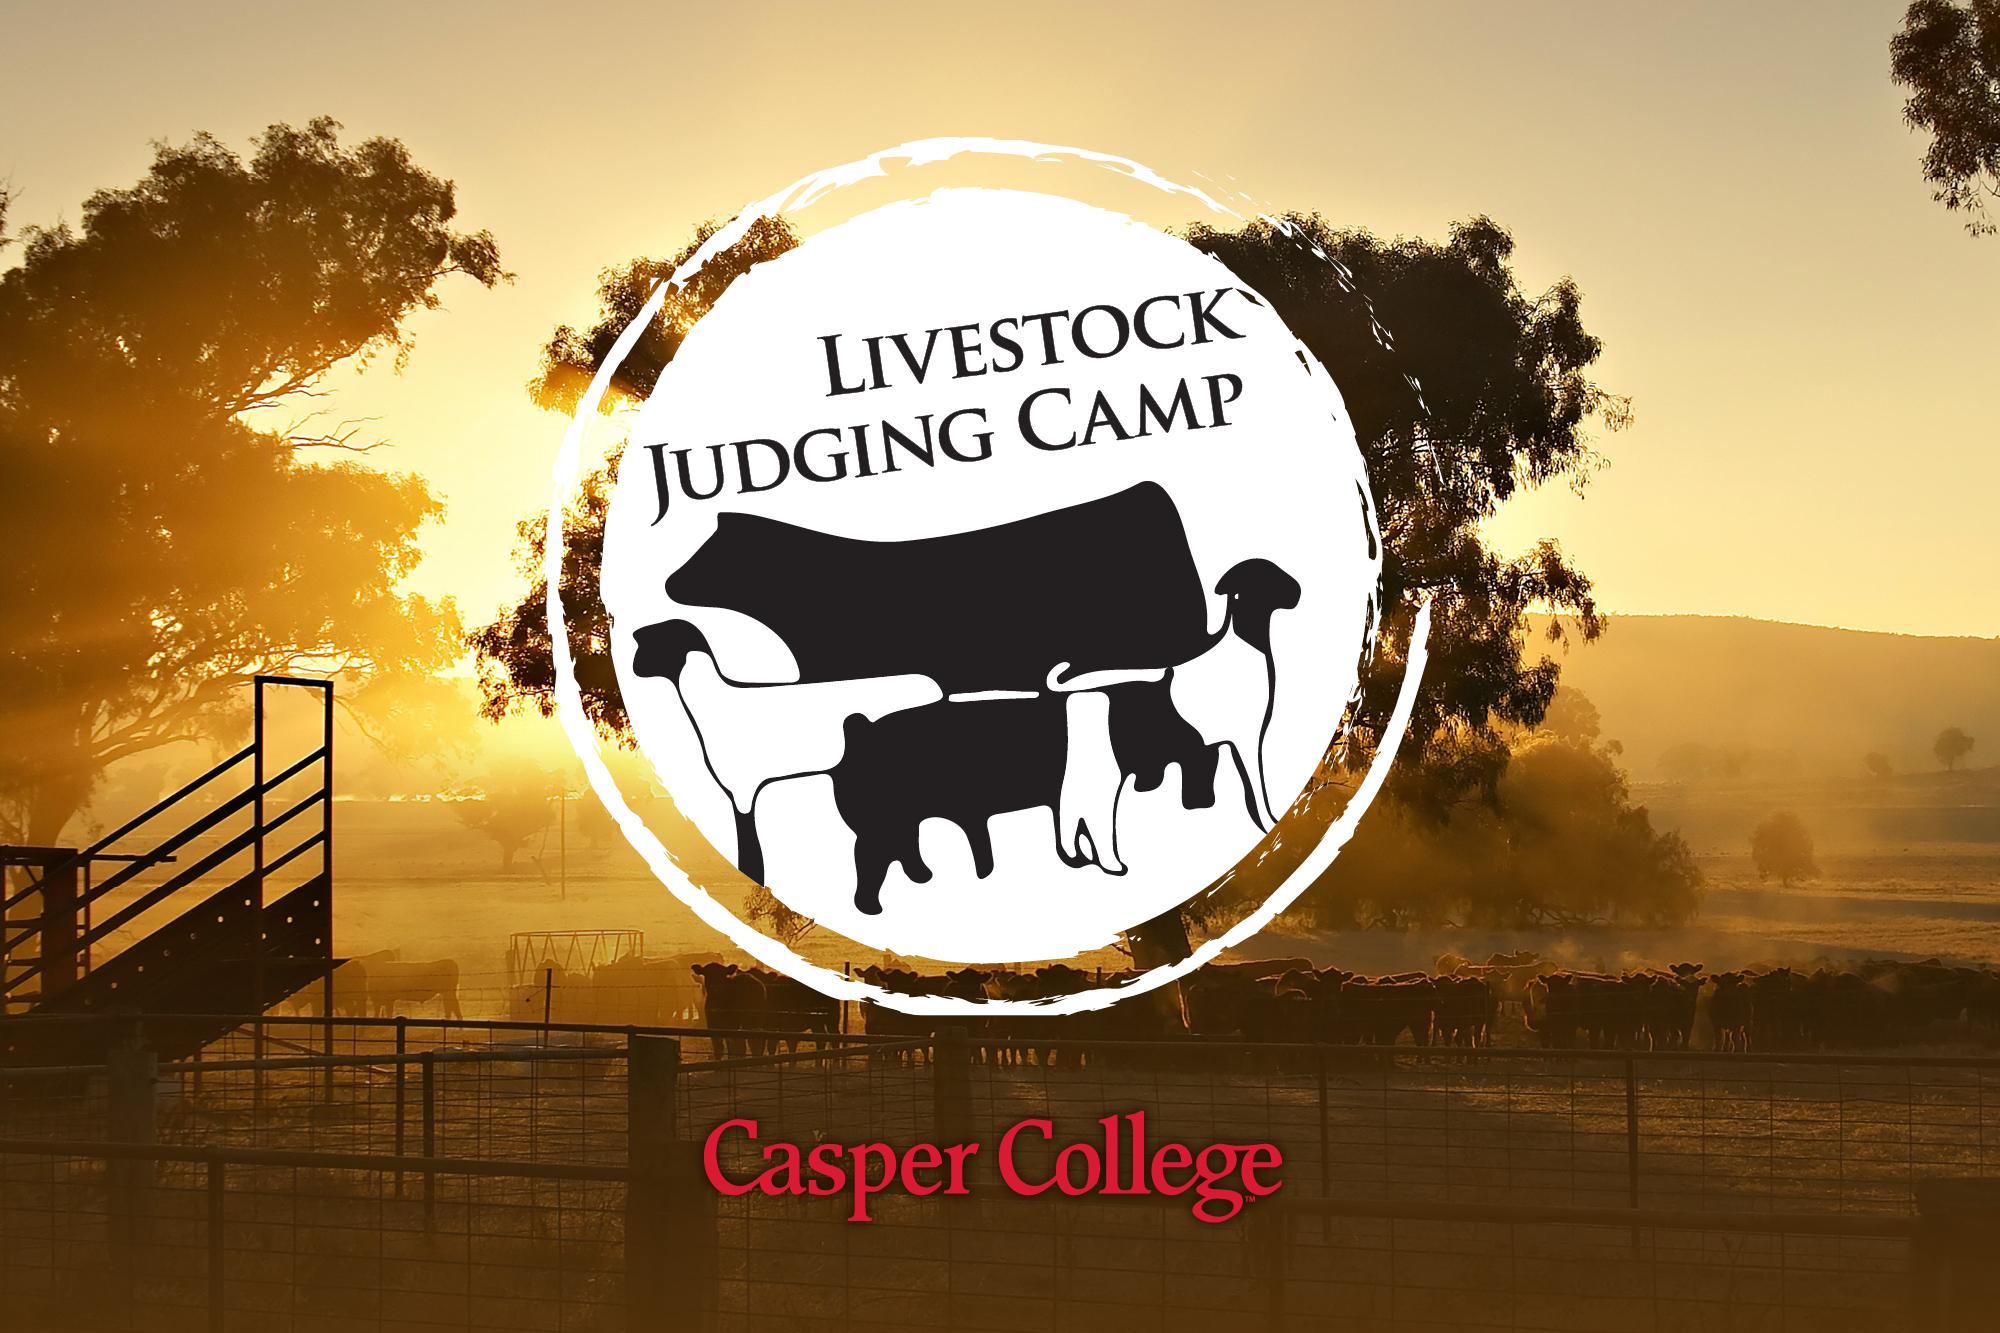 Image of the logo for the Casper College Livestock Judging Camp.